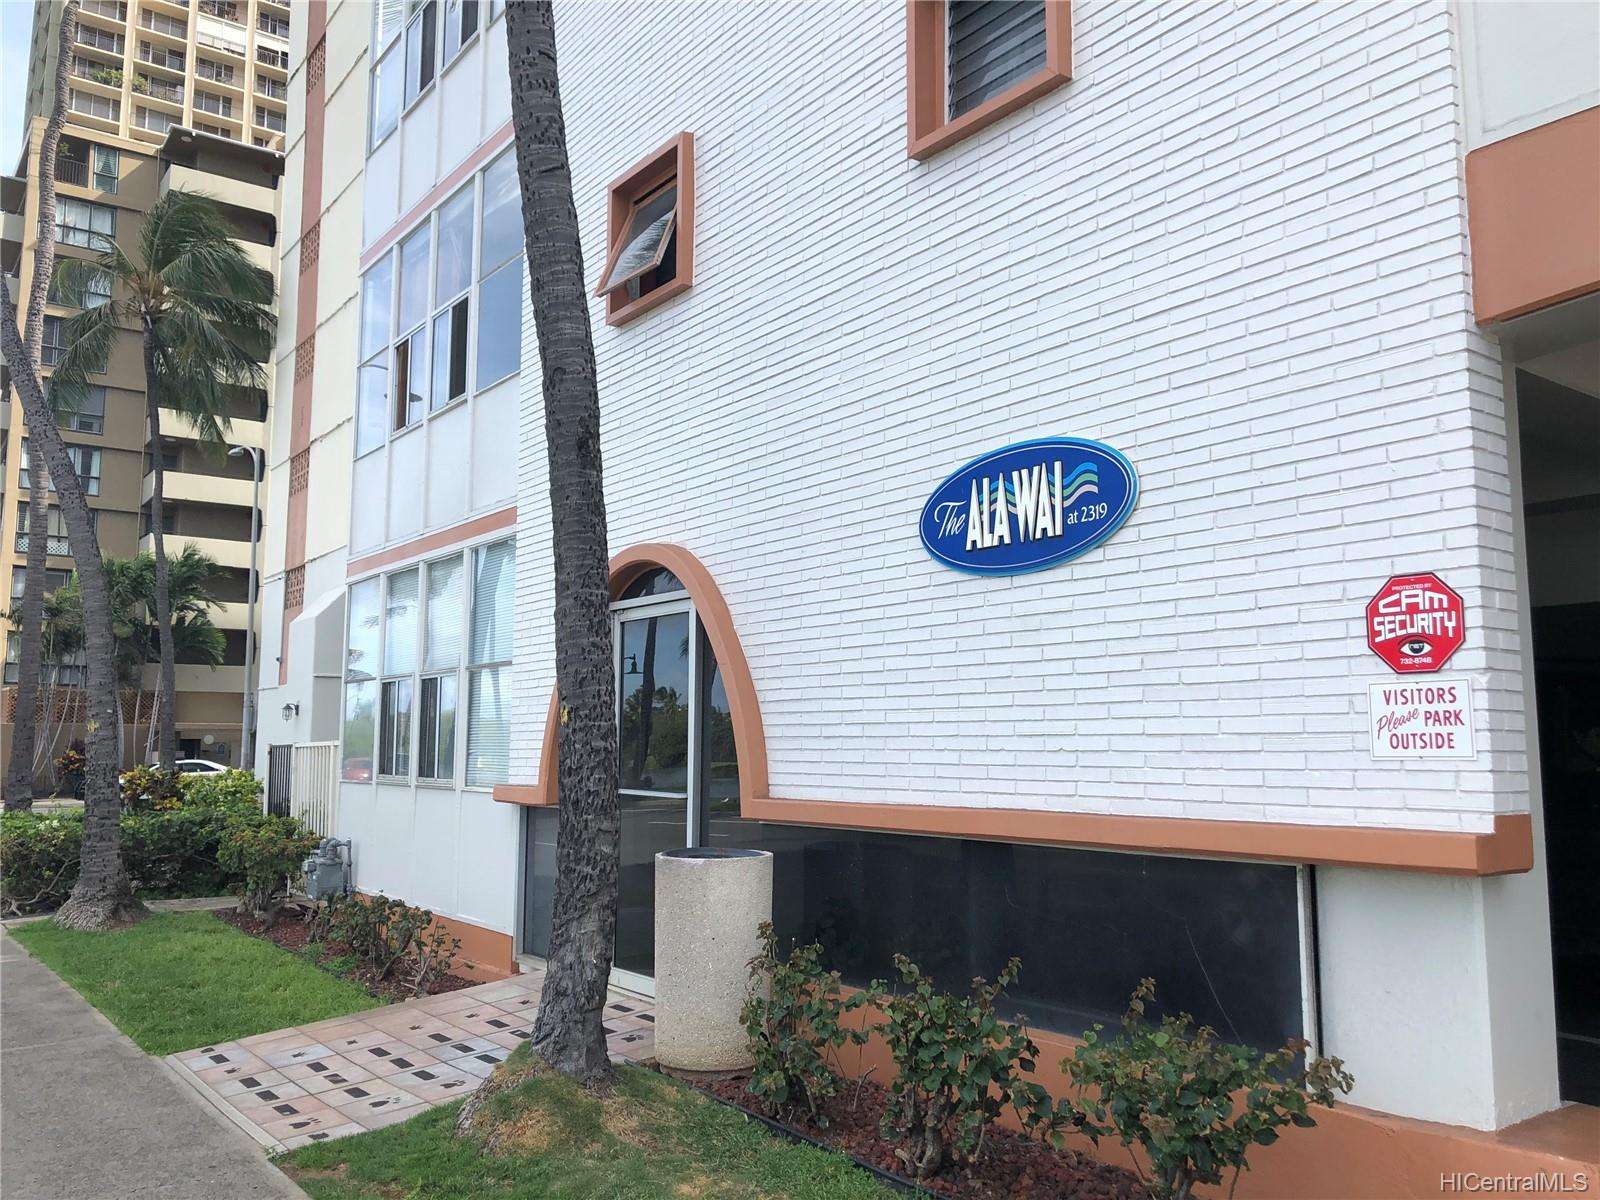 2319 Ala Wai Blvd Honolulu Oahu commercial real estate photo2 of 21